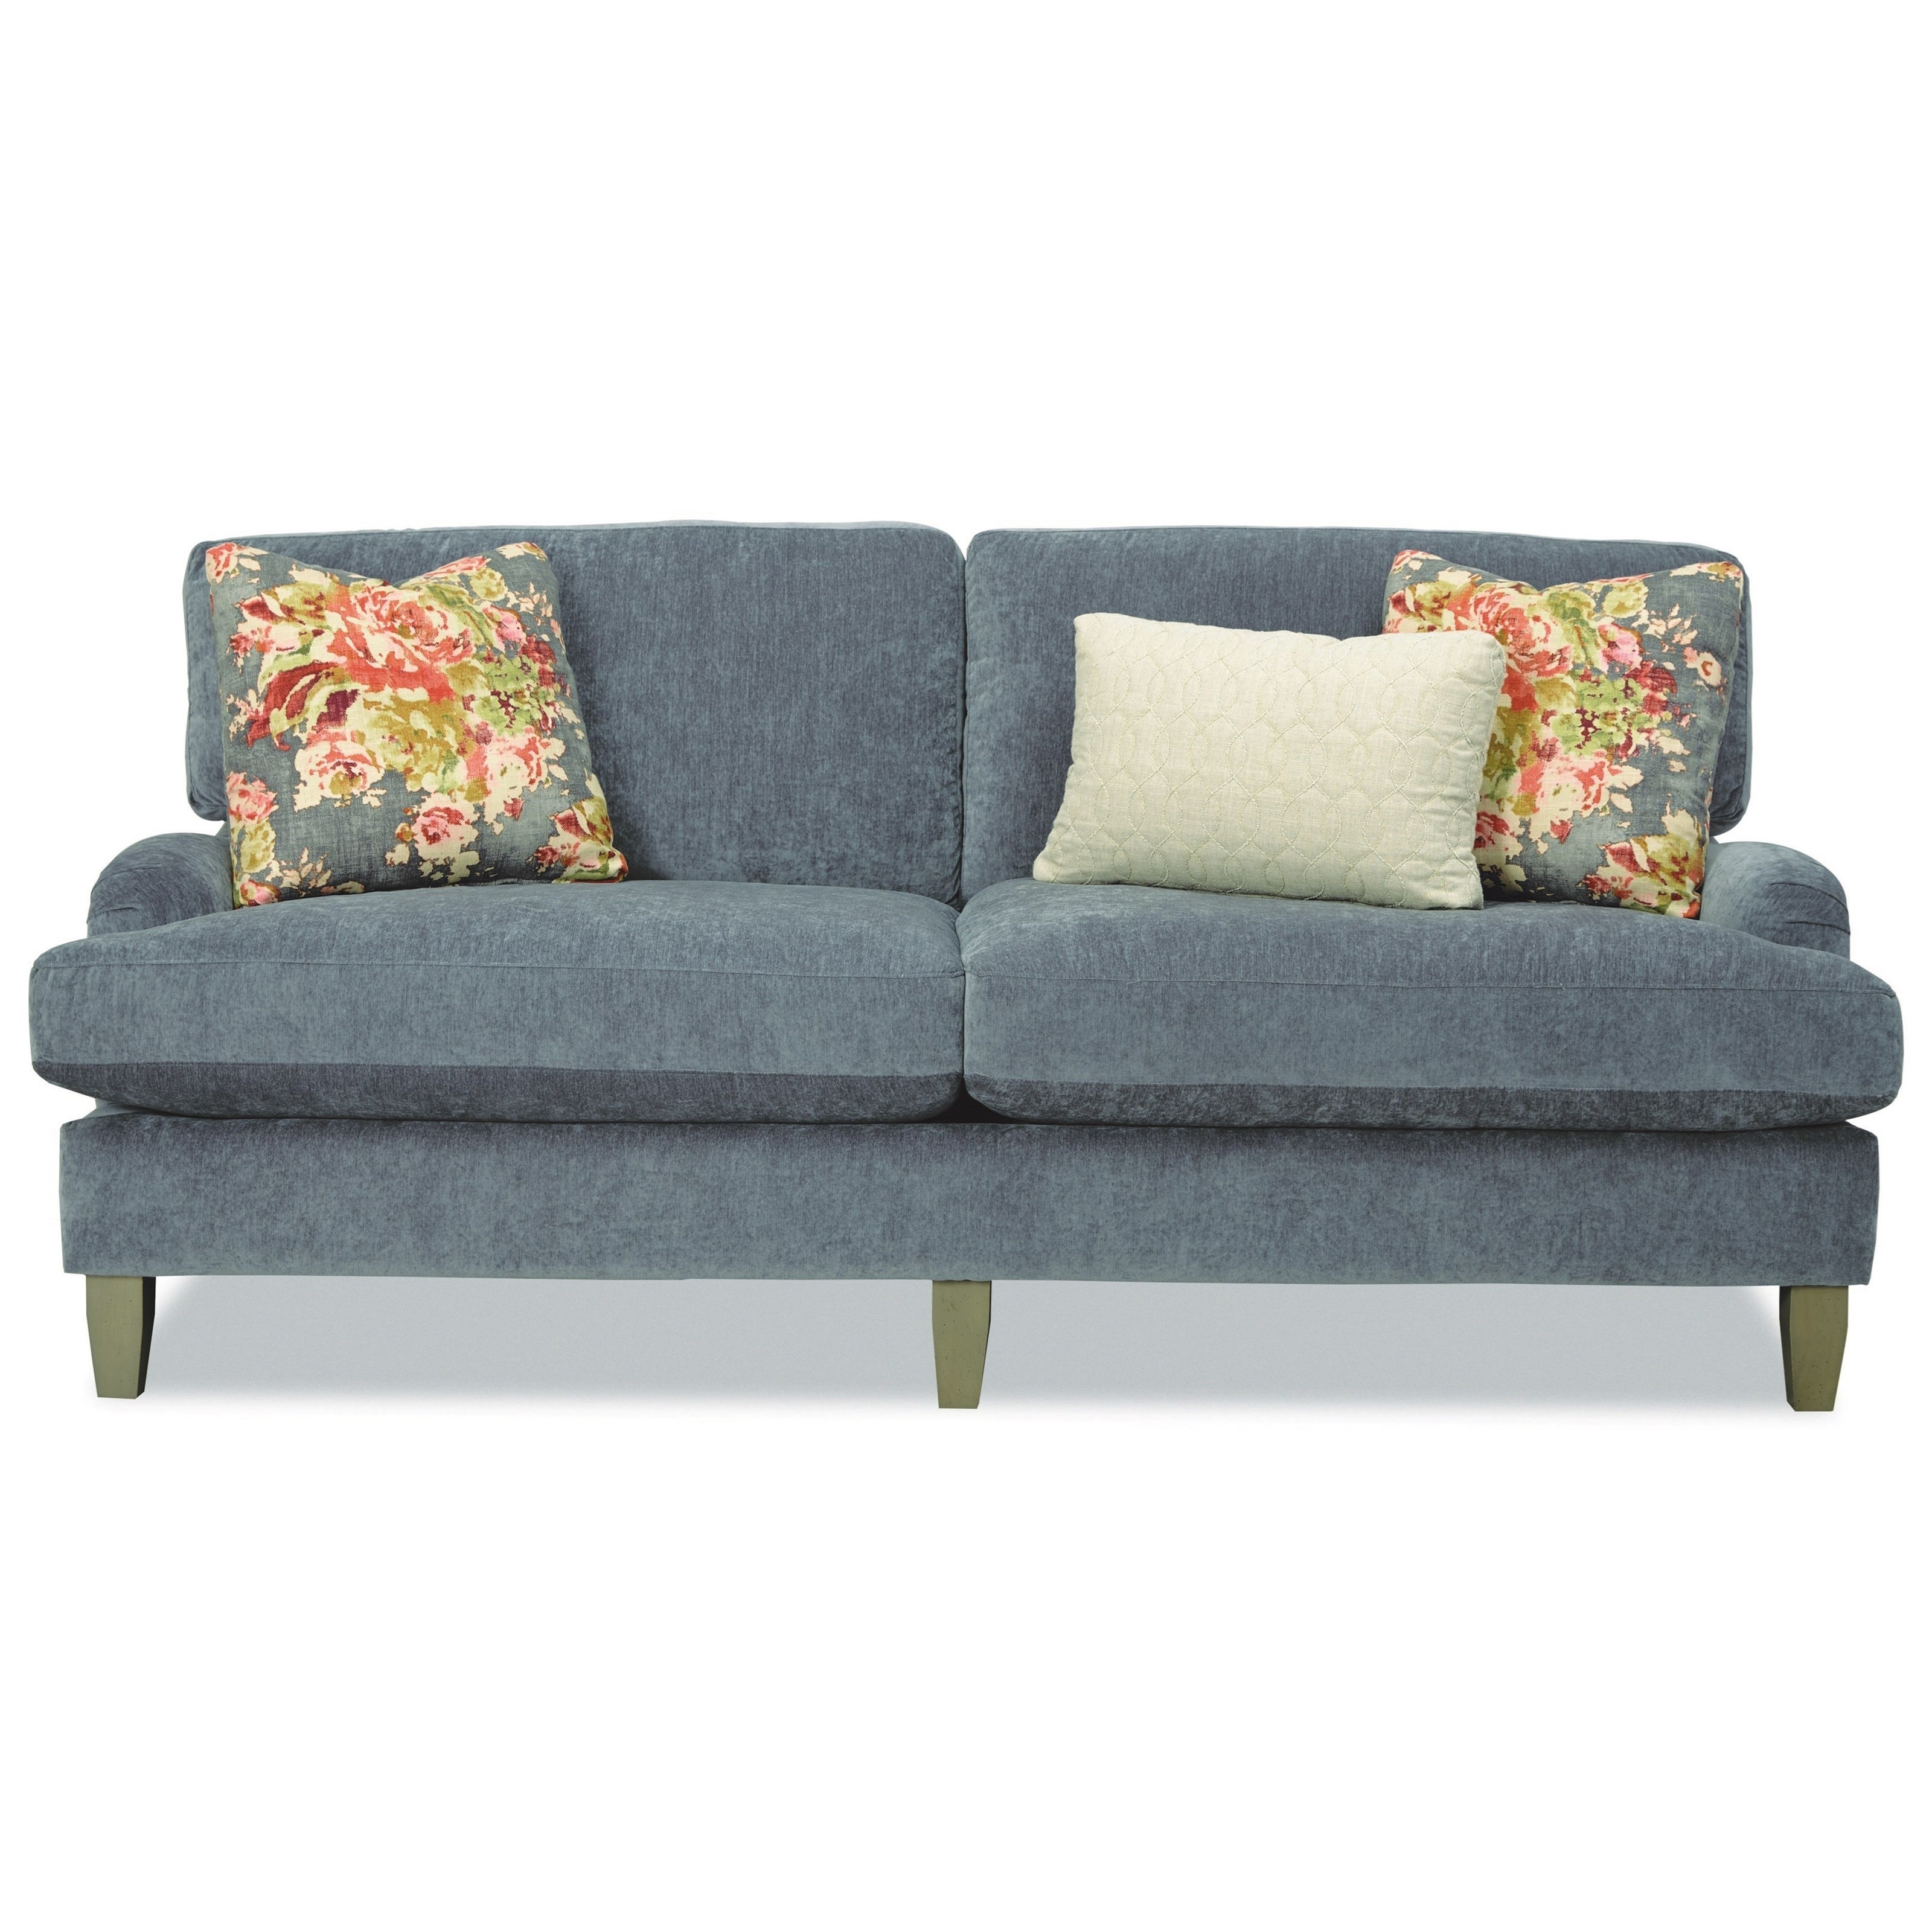 Fullsize Of Apartment Size Sofa